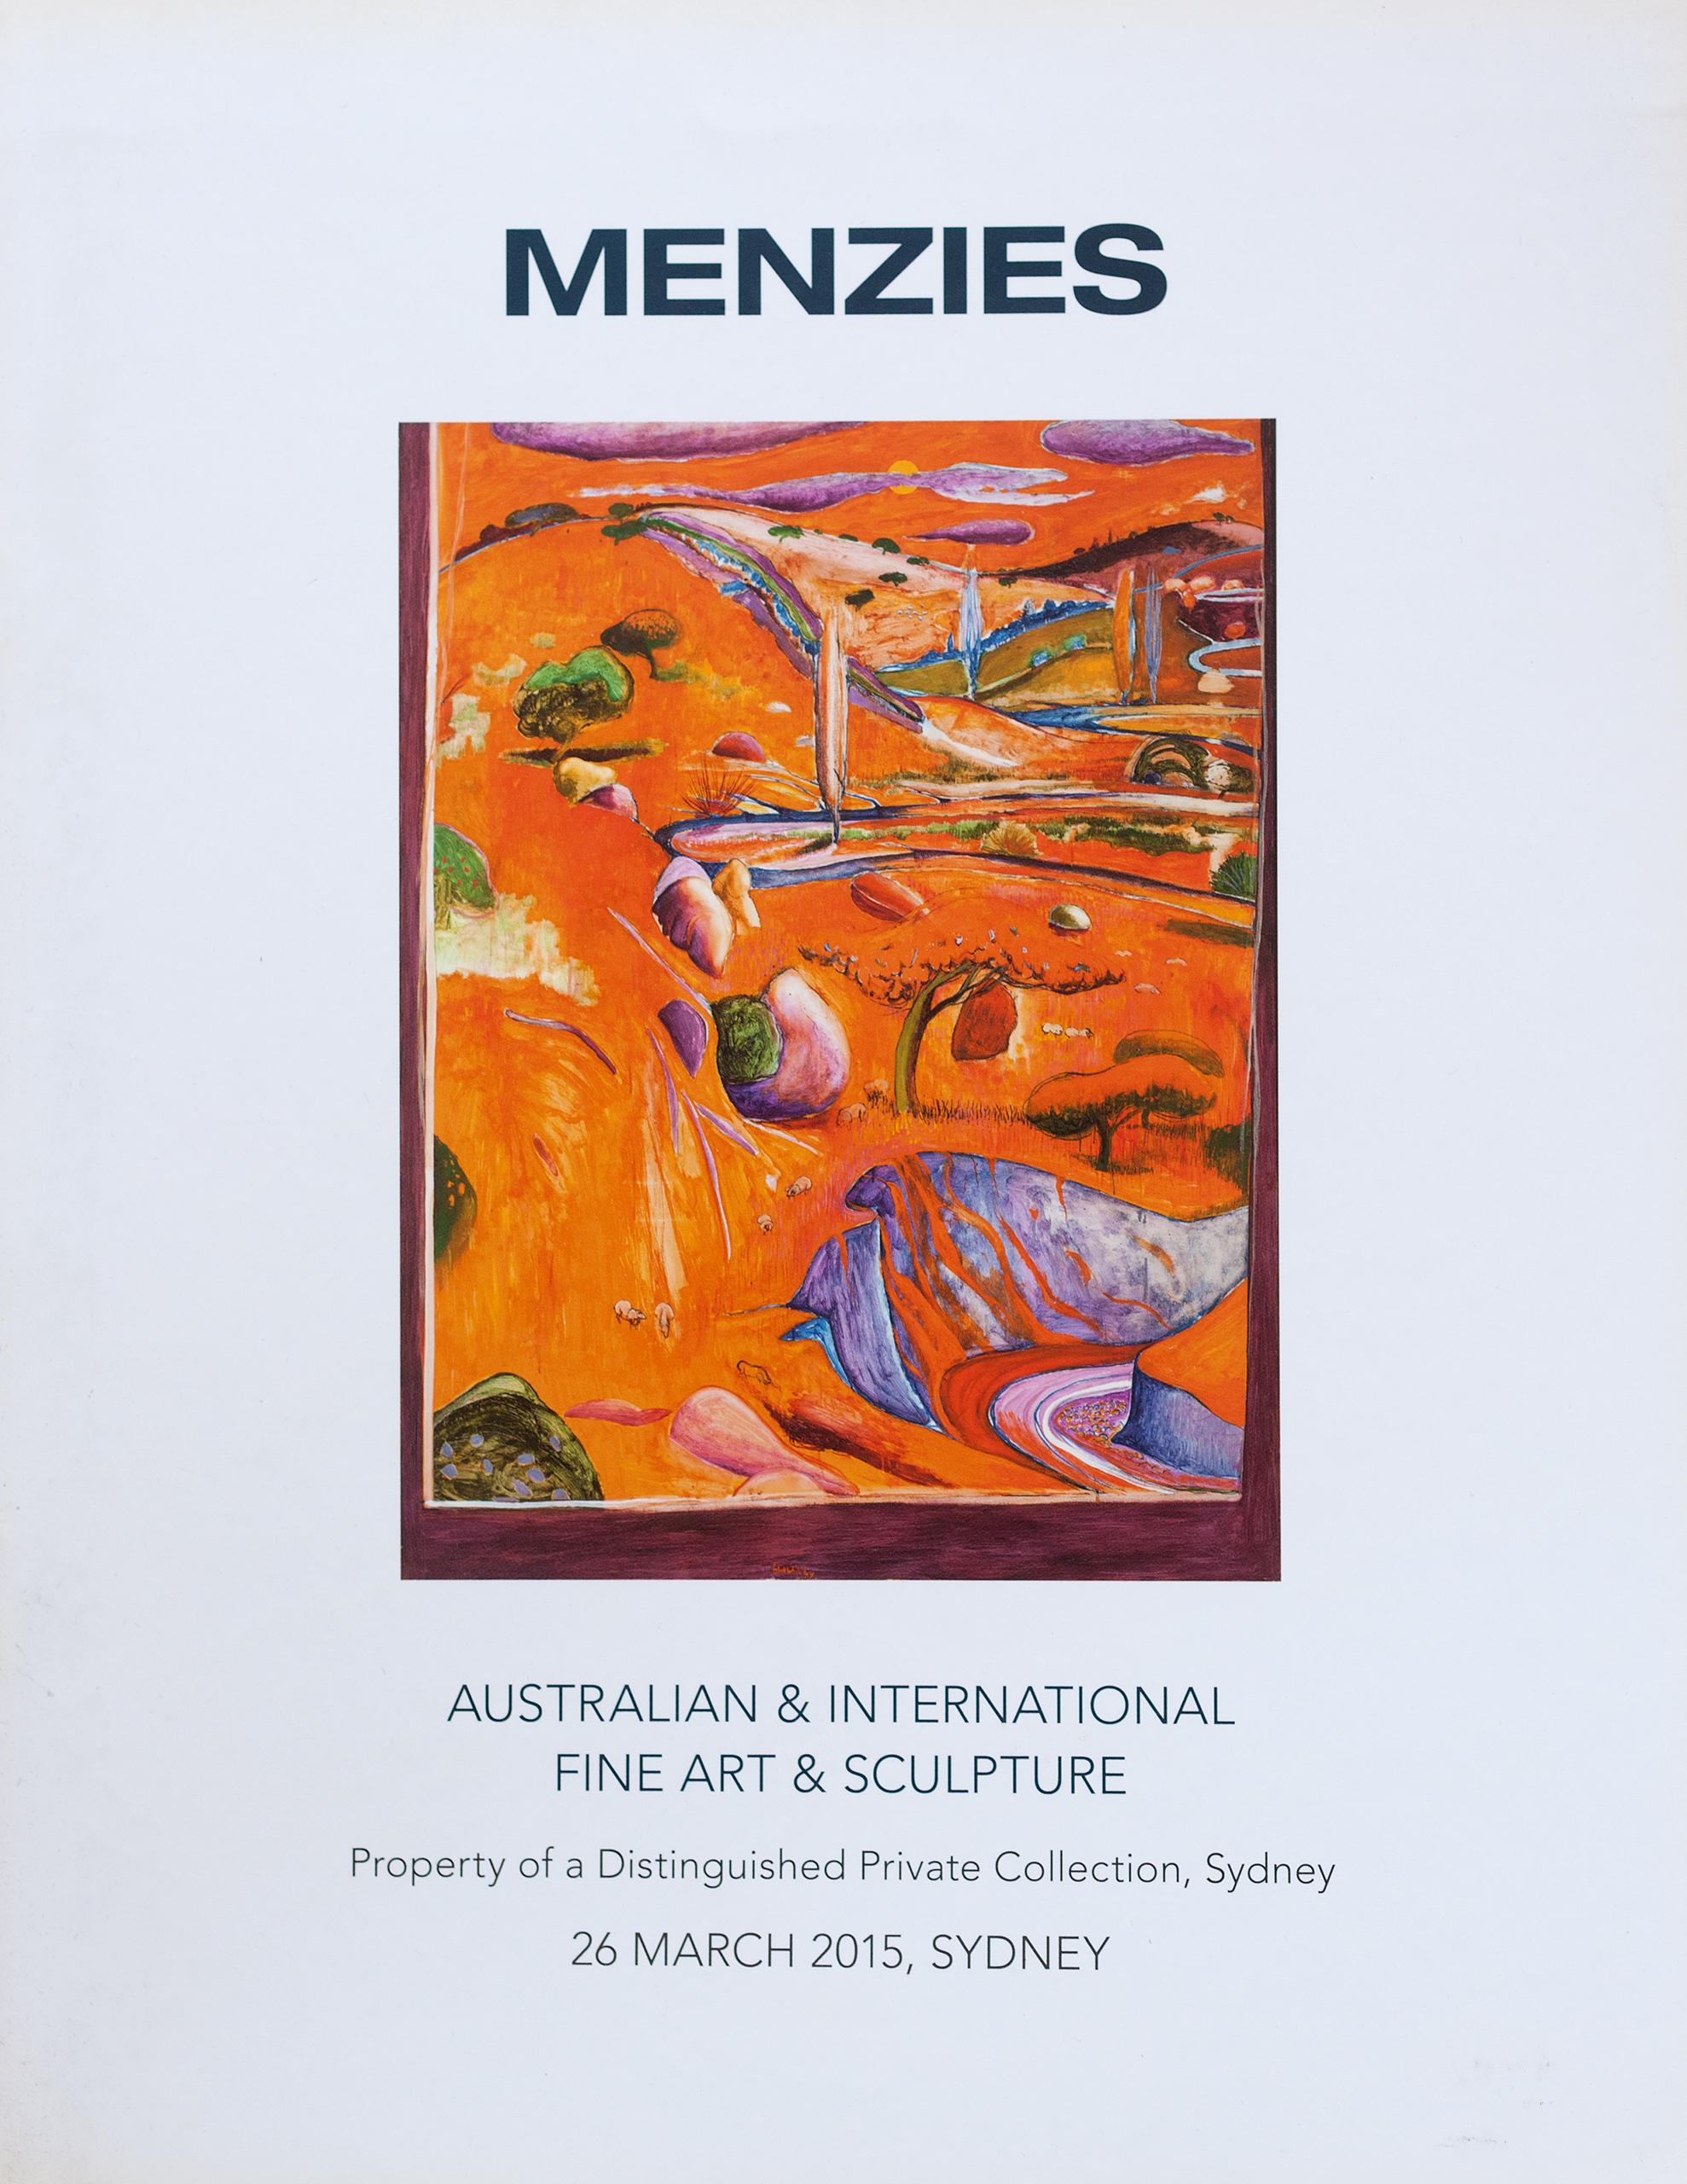 171023 Menzies Catalogues_015.jpg